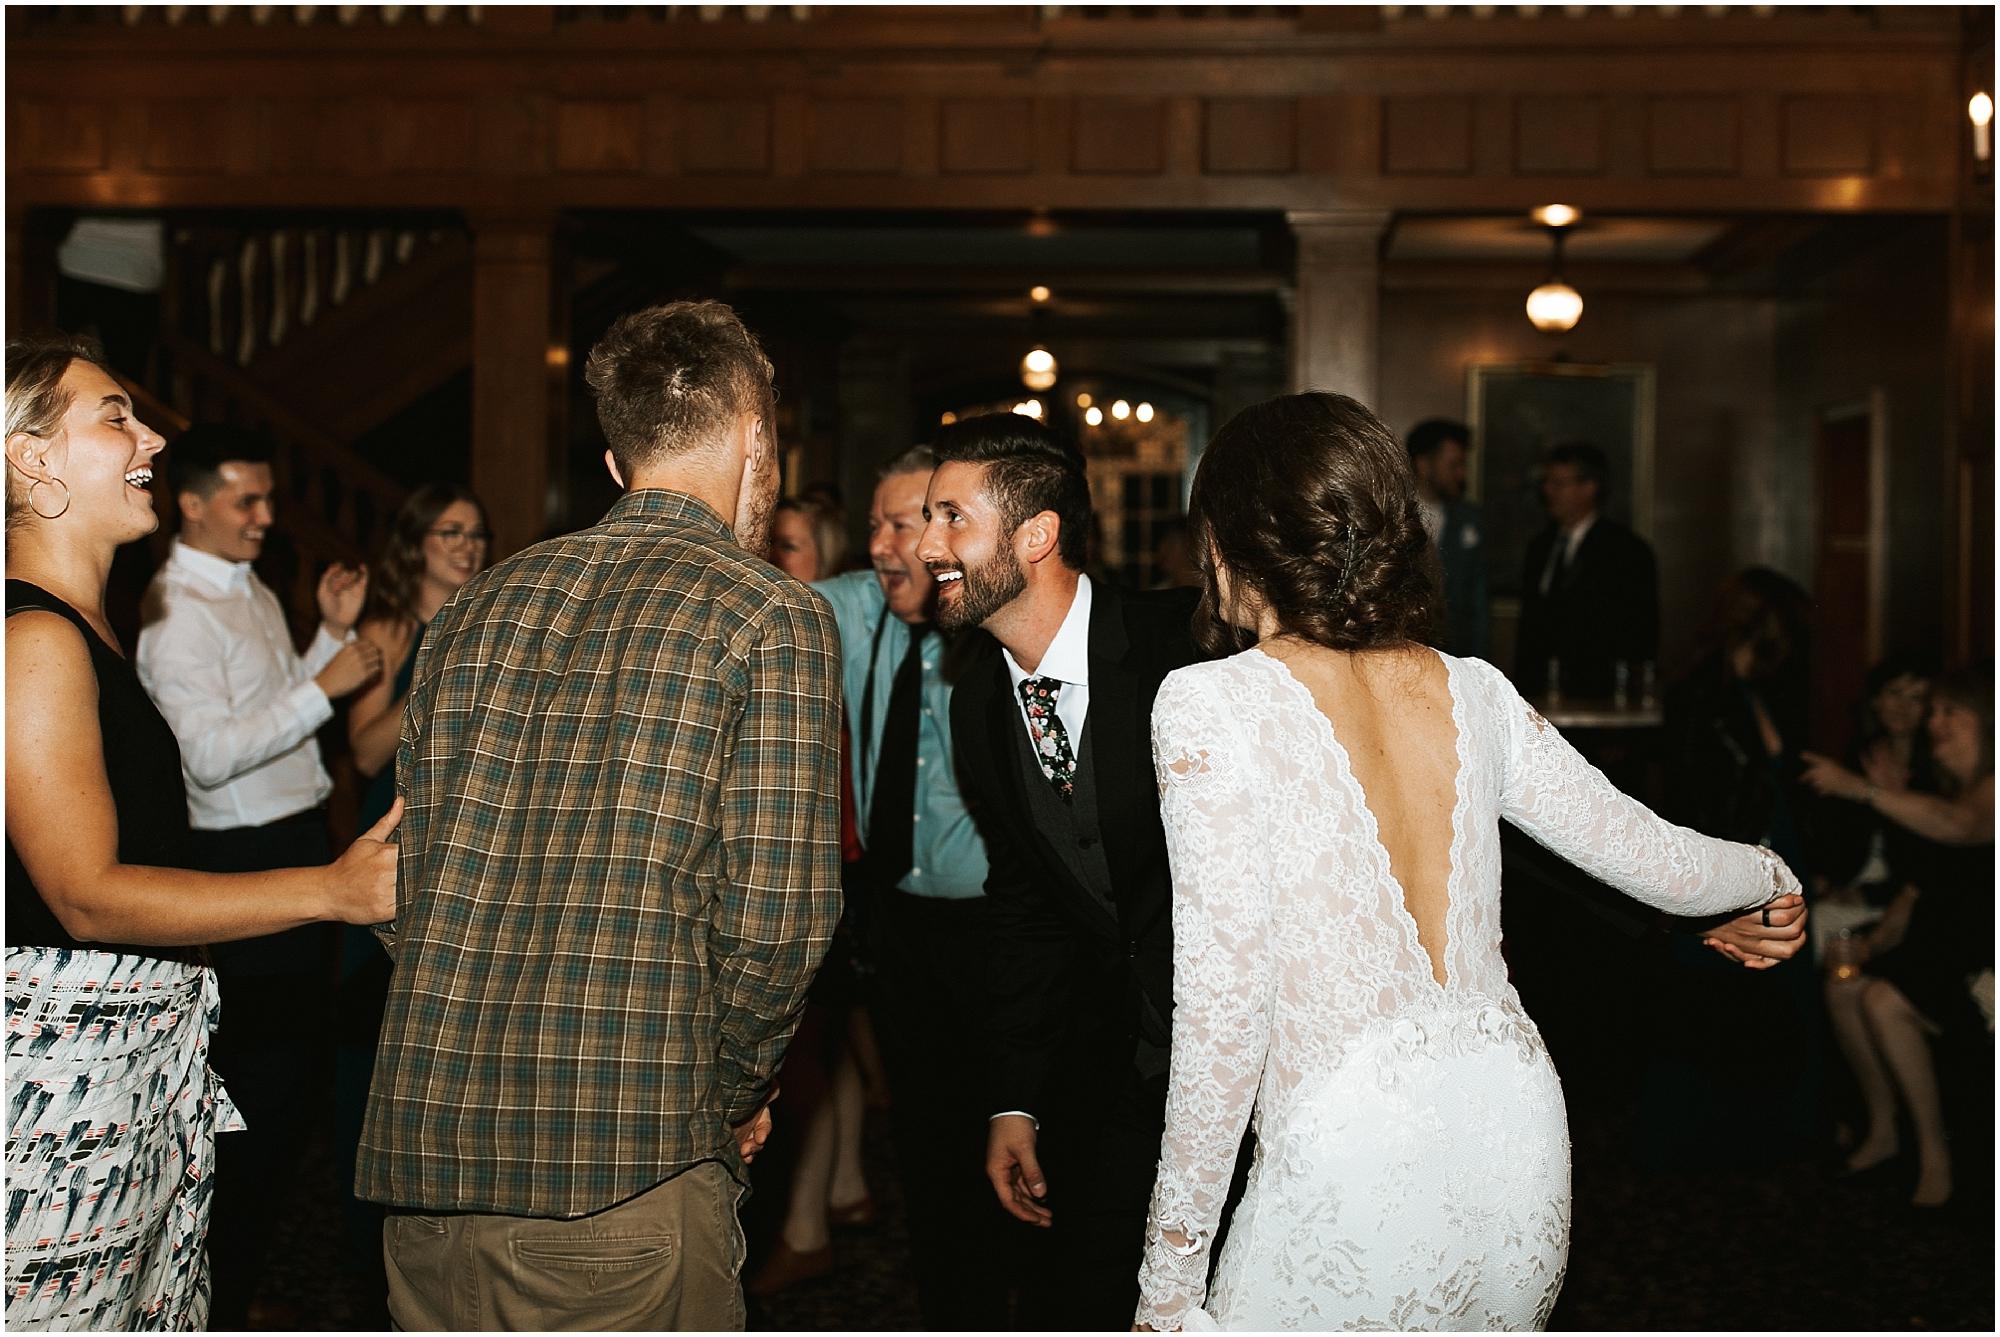 Lairmont Manor Wedding Bellingham Cassie Trottier Photo1133.jpg